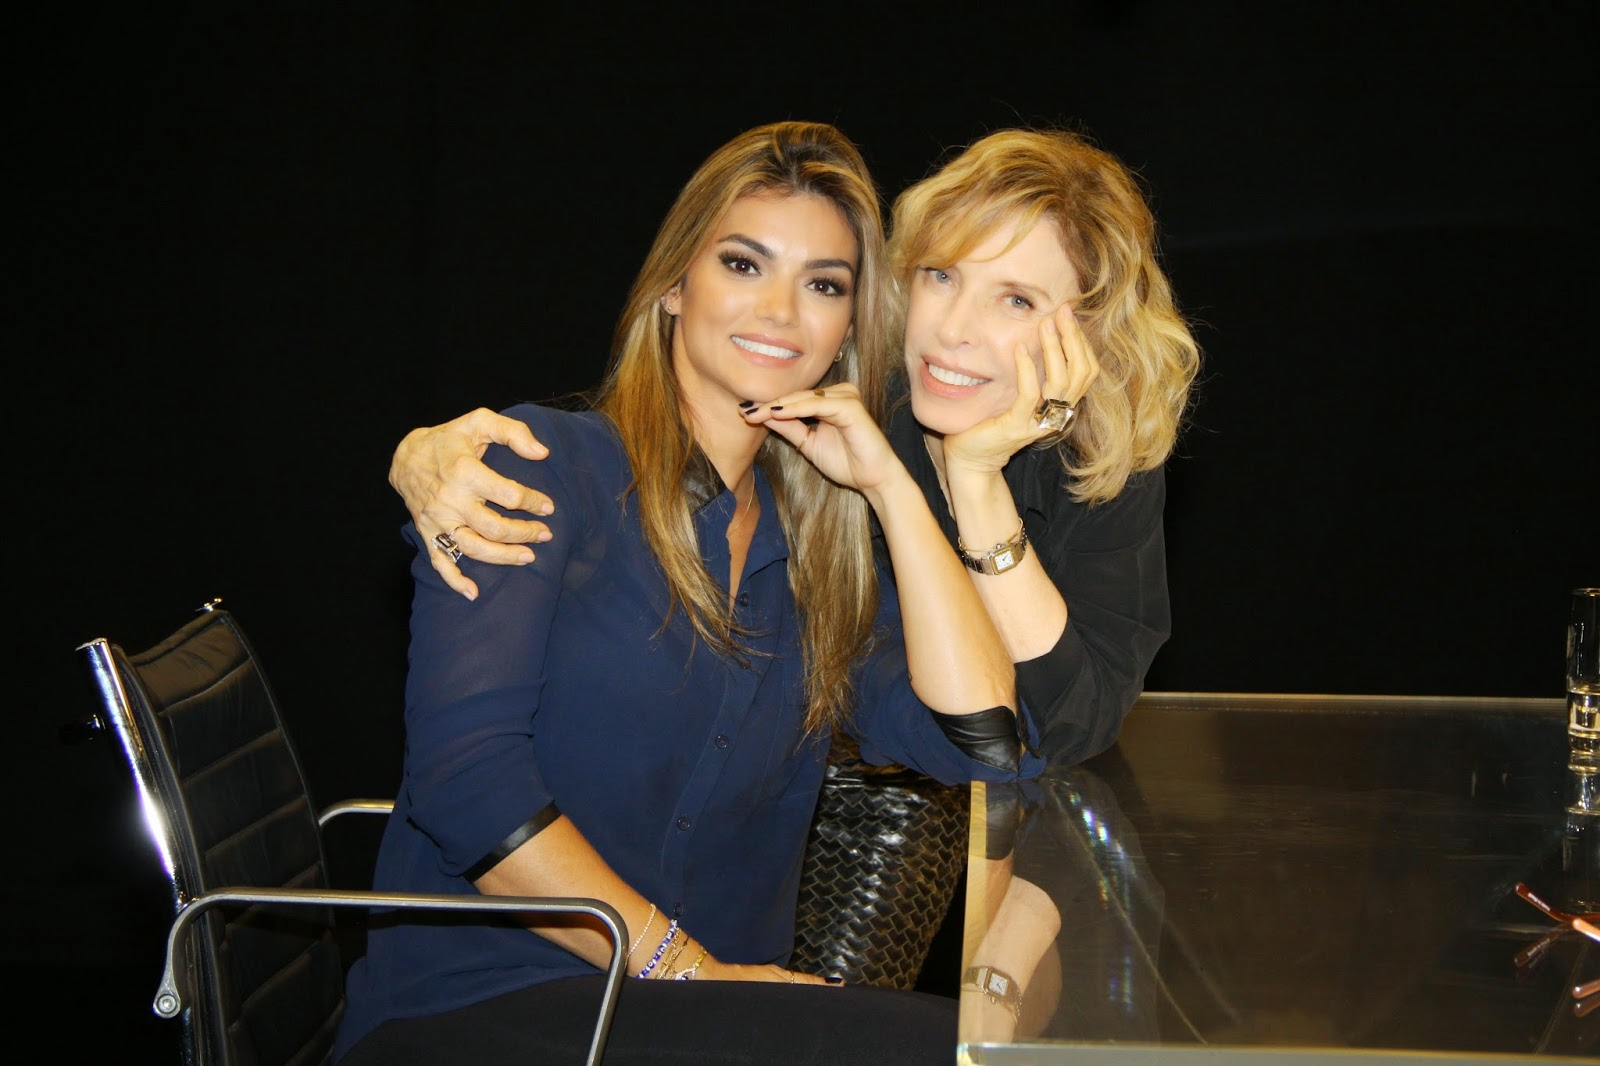 Kelly Key e Marília Gabriela - (Crédito: Carol Soares/SBT)